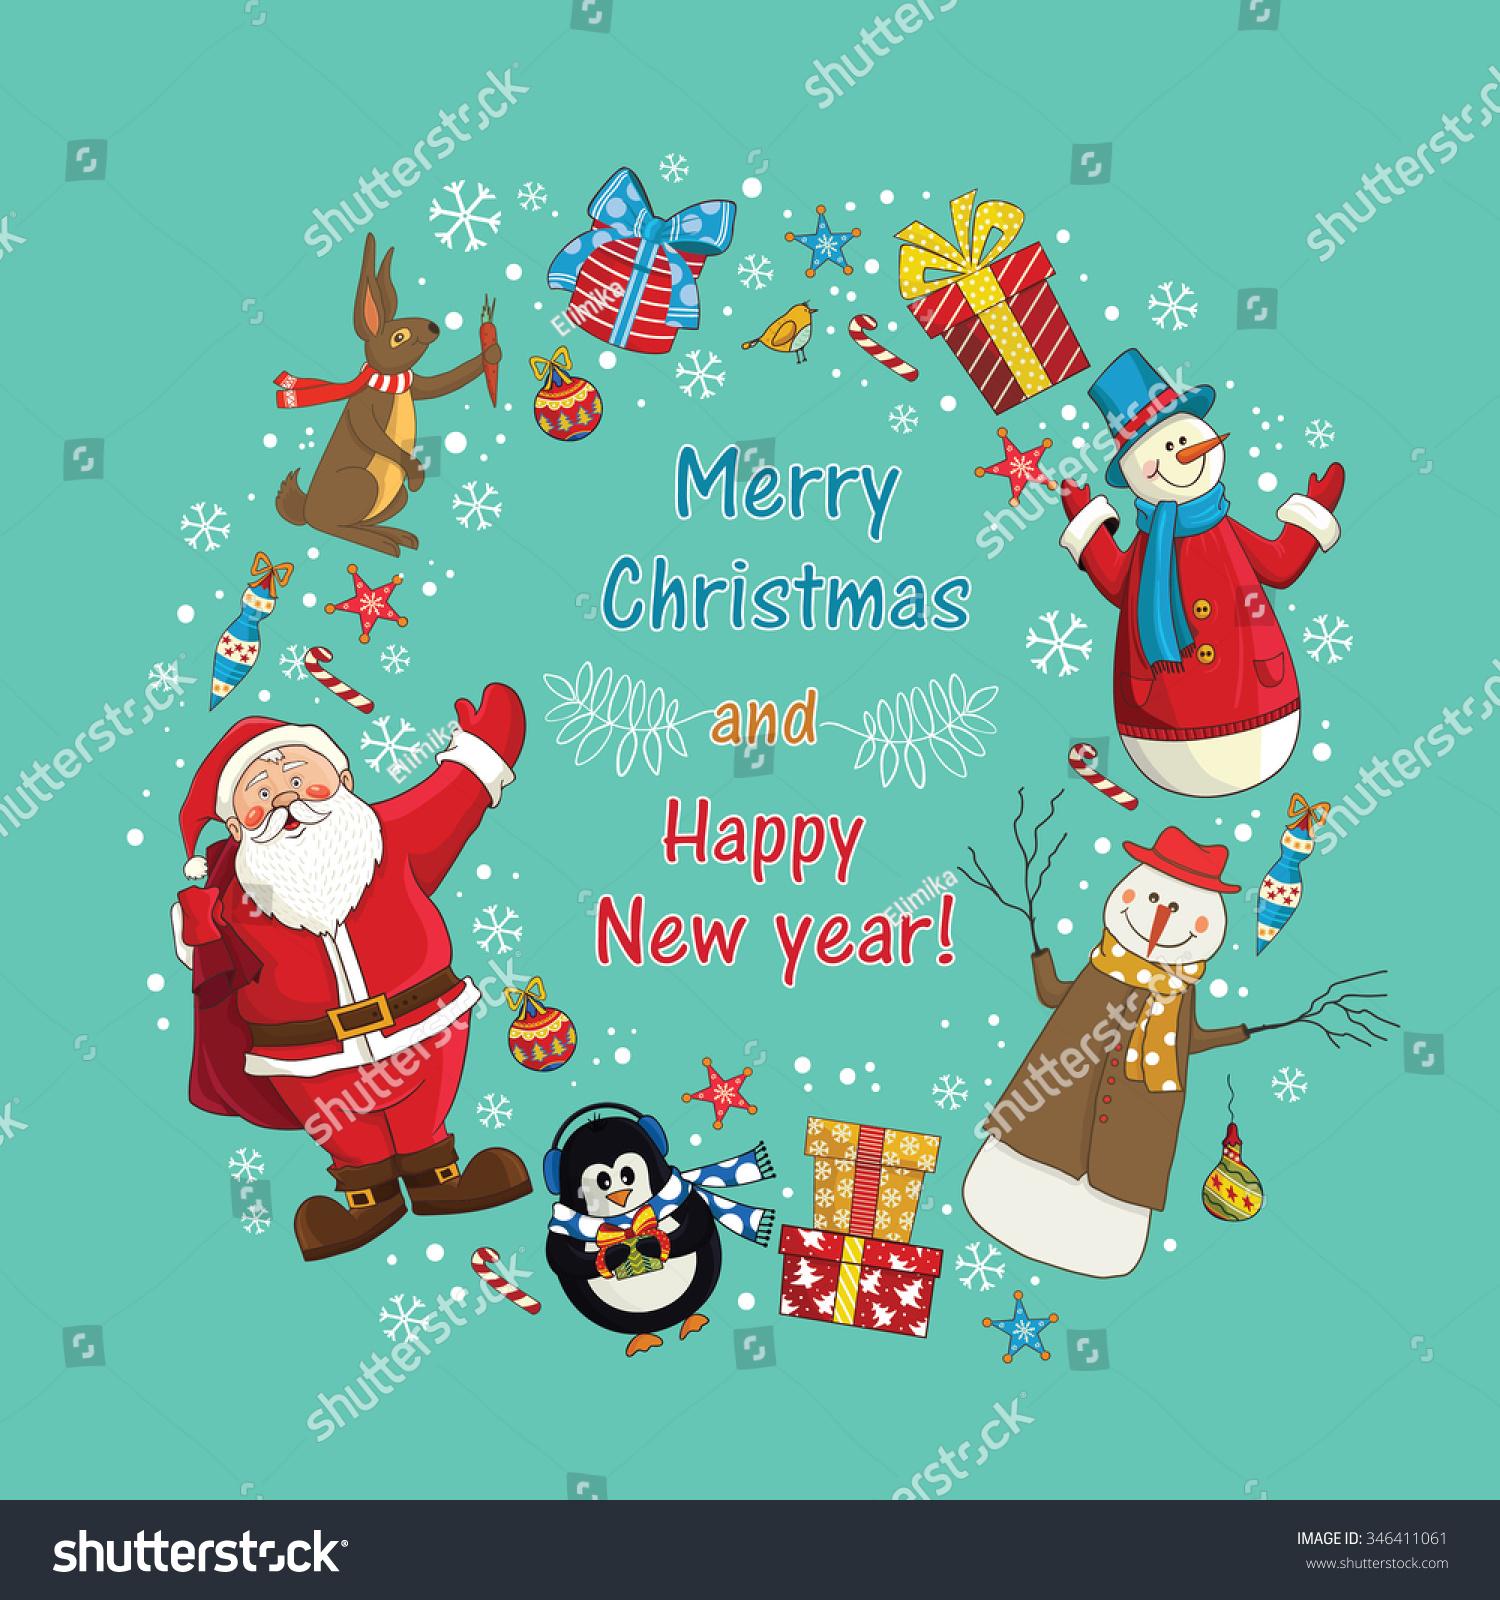 Greeting card christmas card santa claus stock vector royalty free greeting card christmas card with santa claus snowmen hare christmas gifts m4hsunfo